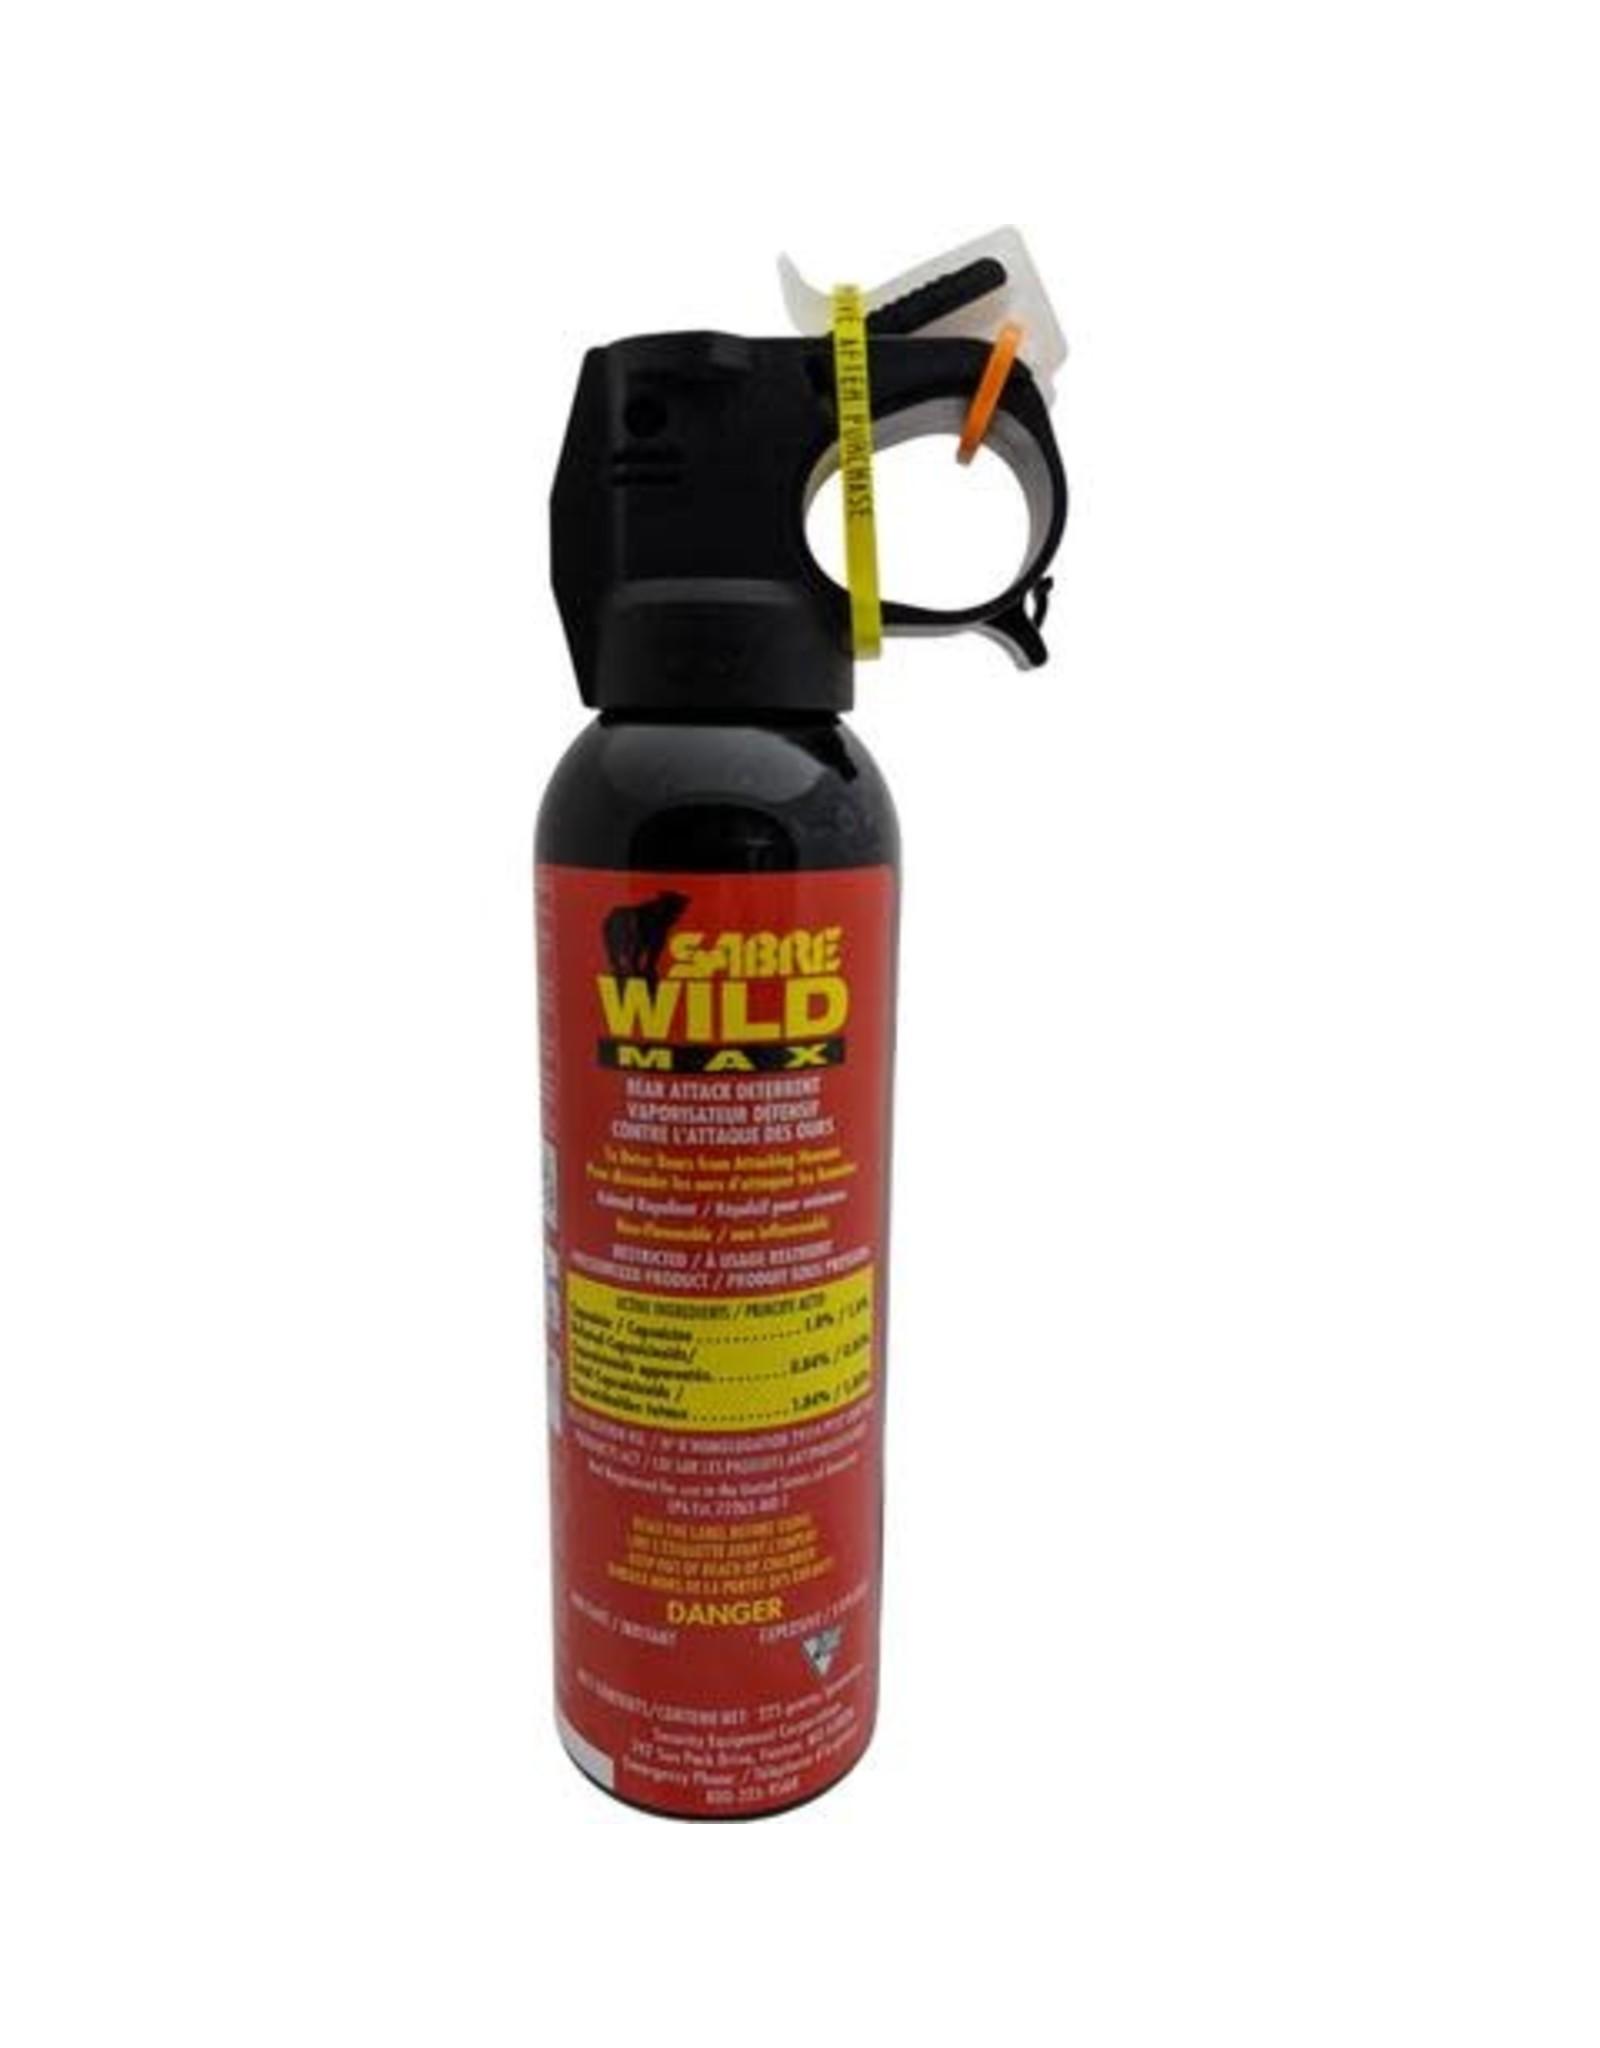 KODIAK WILDLIFE PRODUCTS INC. SABRE WILD BEAR SPRAY 225gr